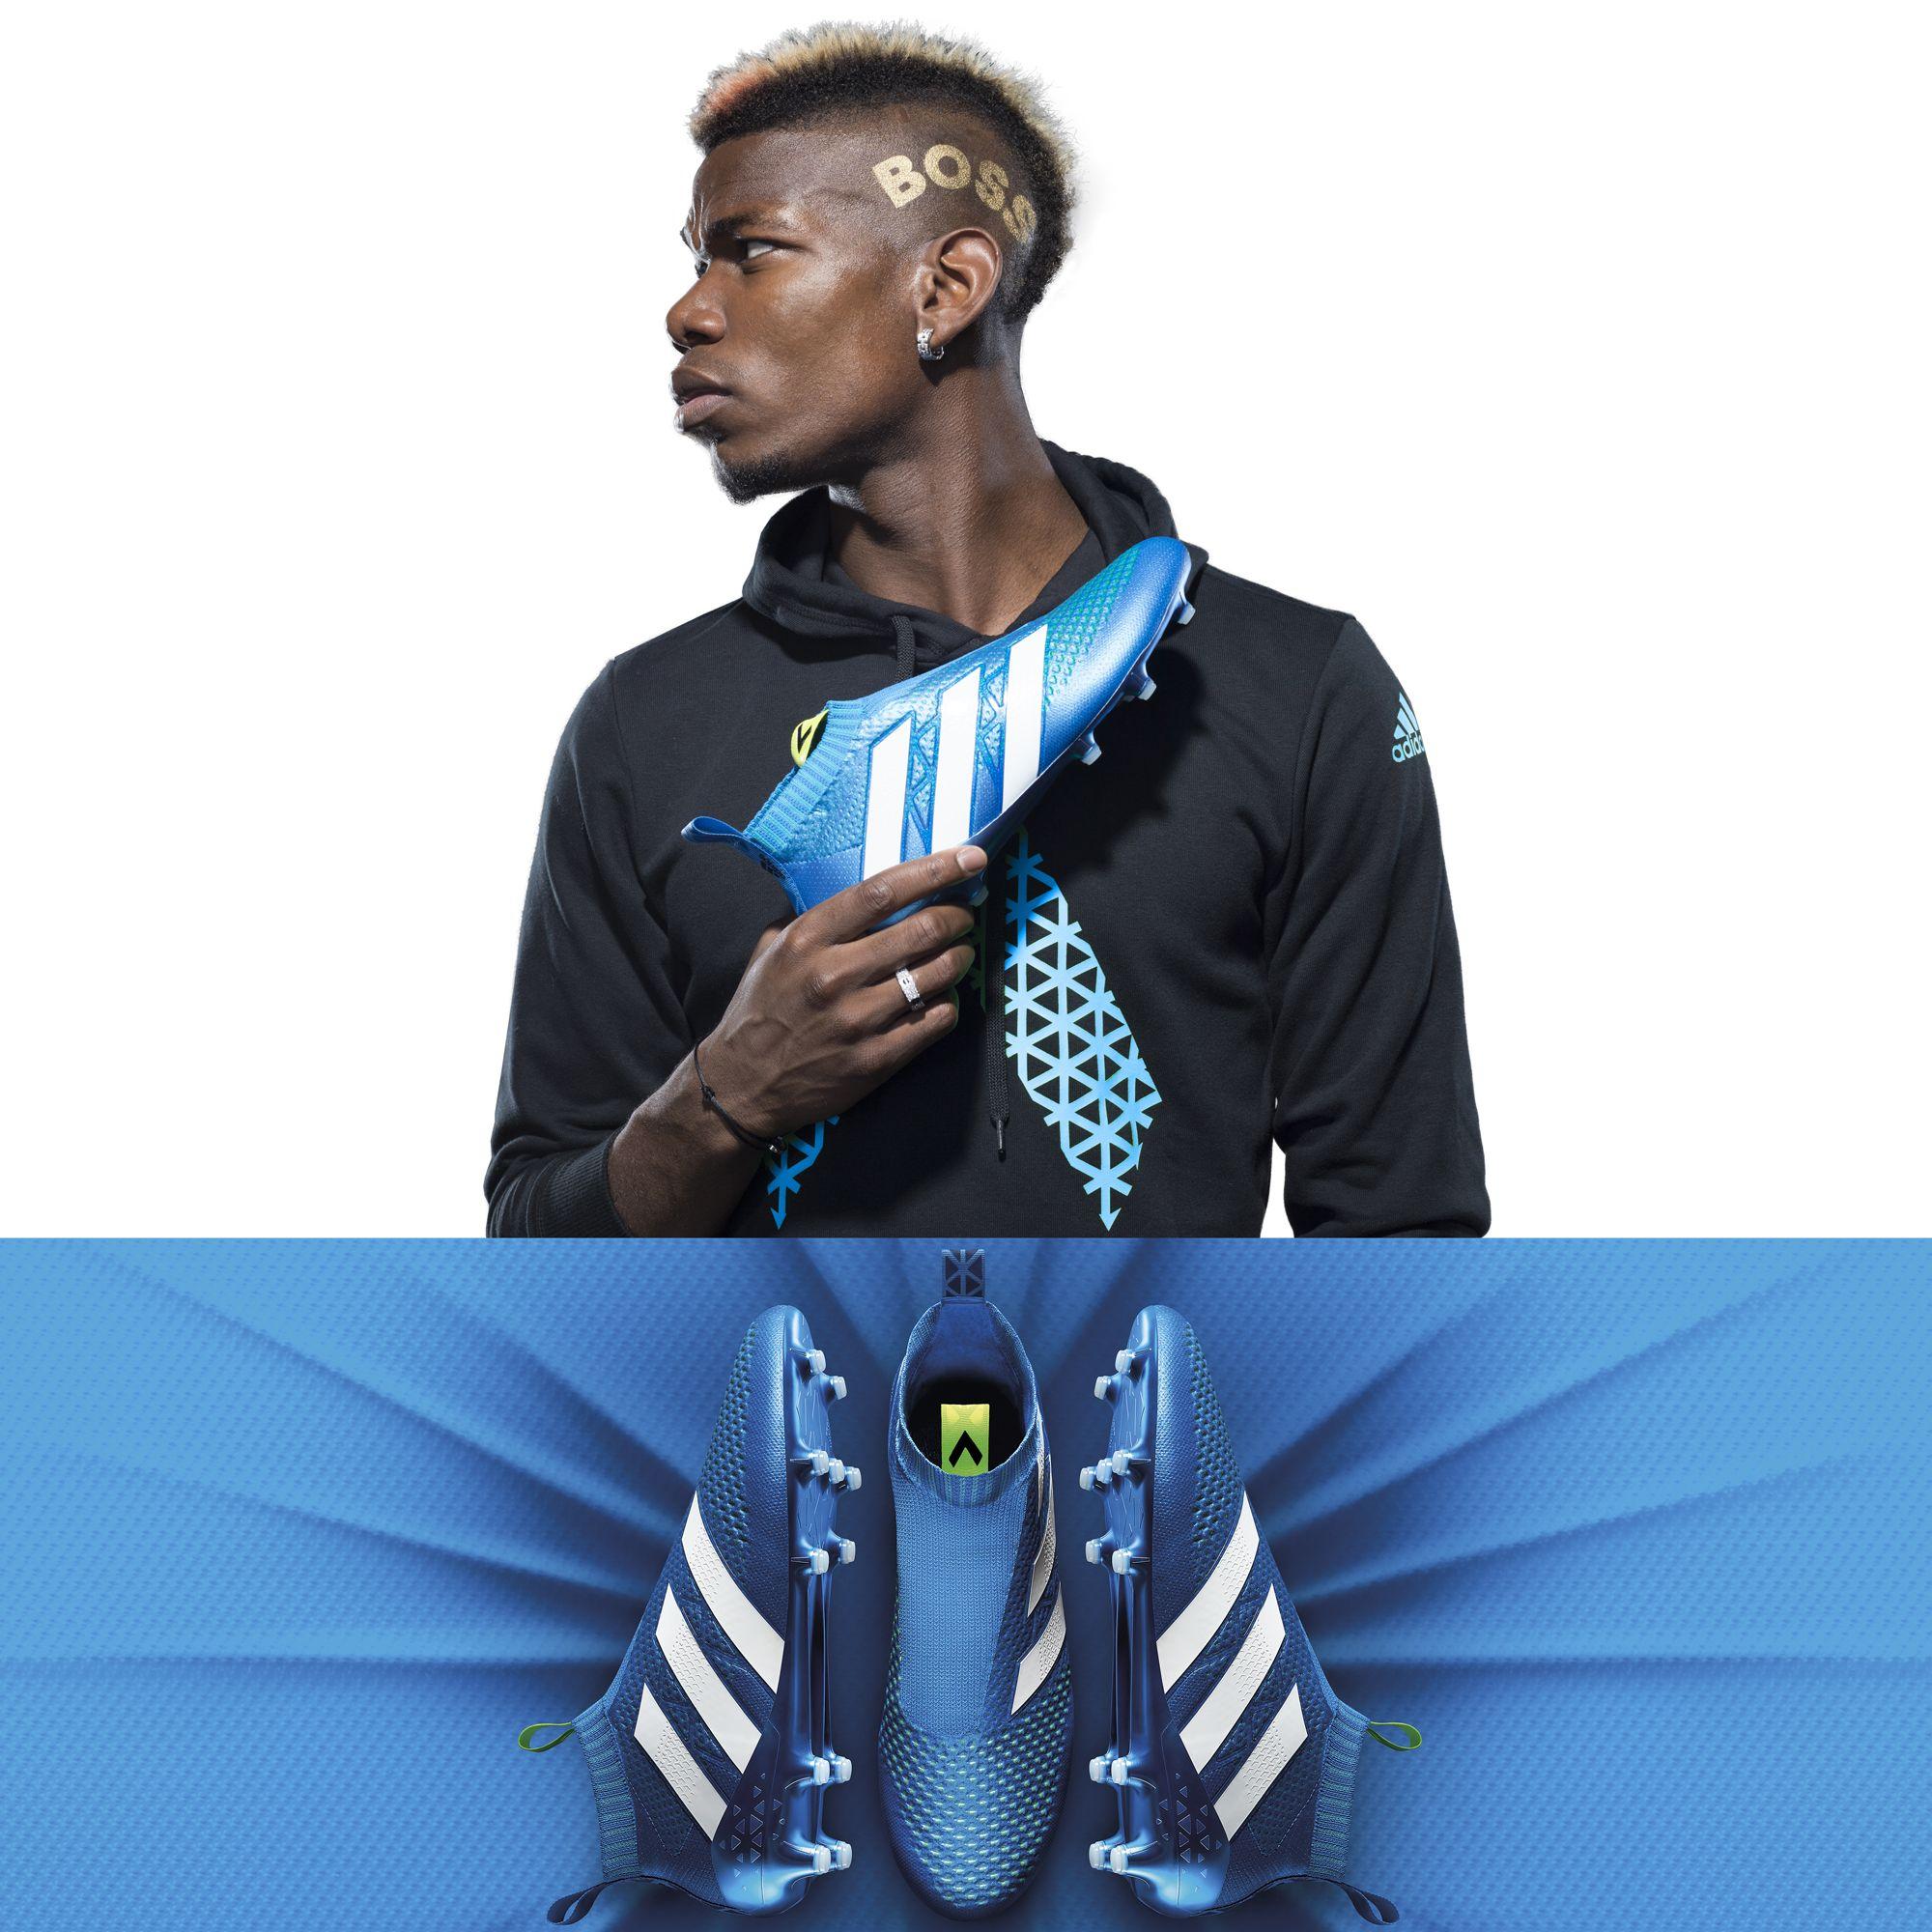 Bild Paul Pogba Mit Seinem Ace 16 Purecontrol Fussballschuh